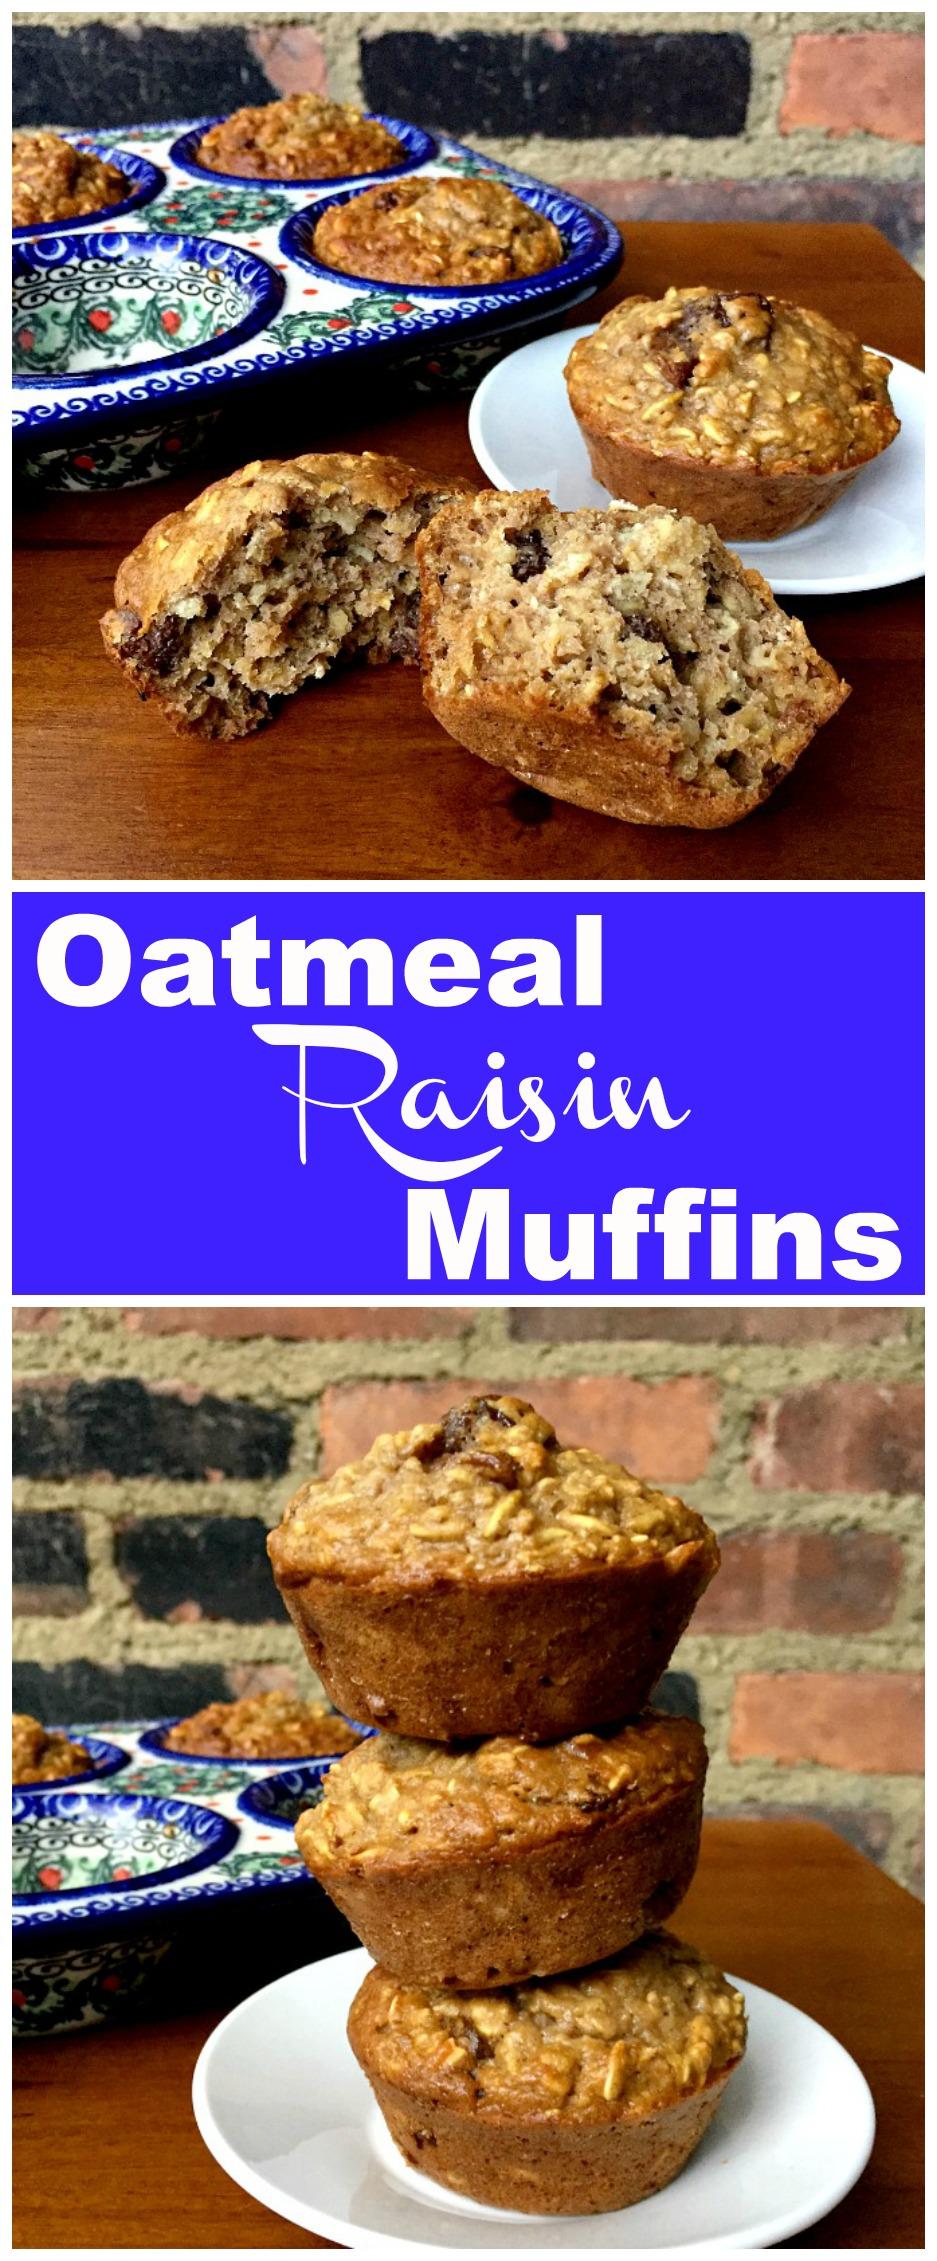 Oatmeal Raisin Muffins Recipe Raisin Muffins Oatmeal